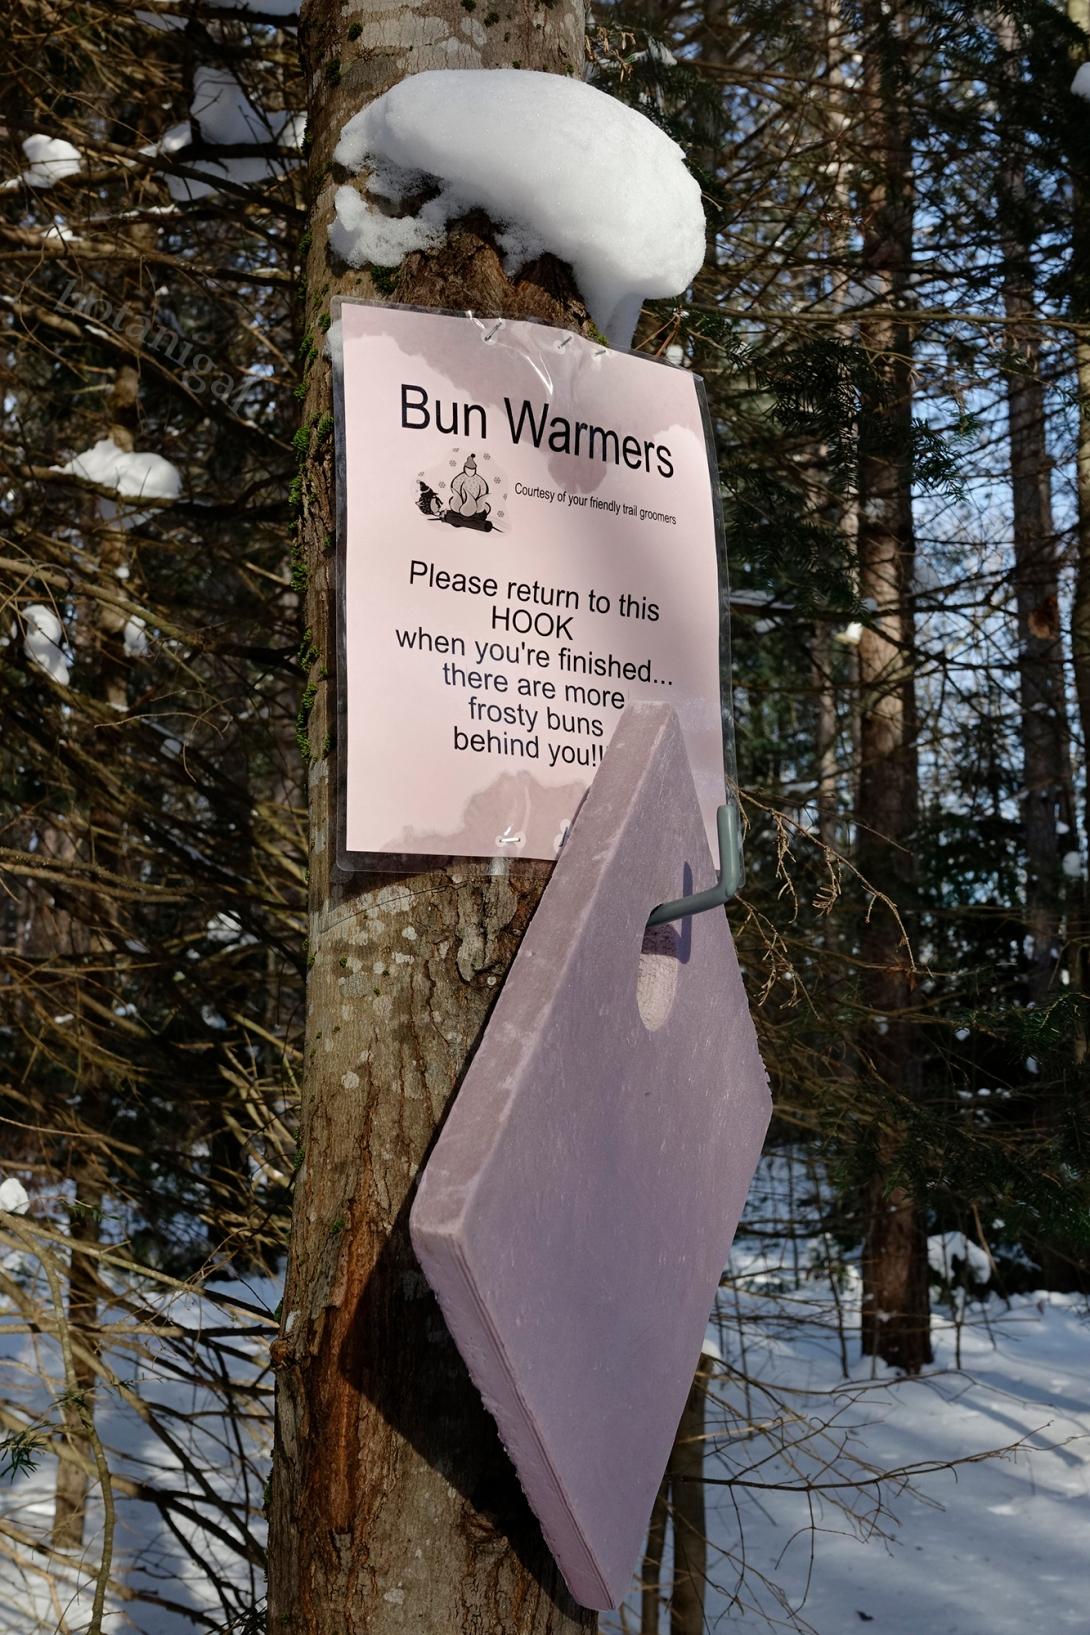 22. R.K. Bun Warmers BRMC Feb 13 2018 wtm_RXB1703.jpg